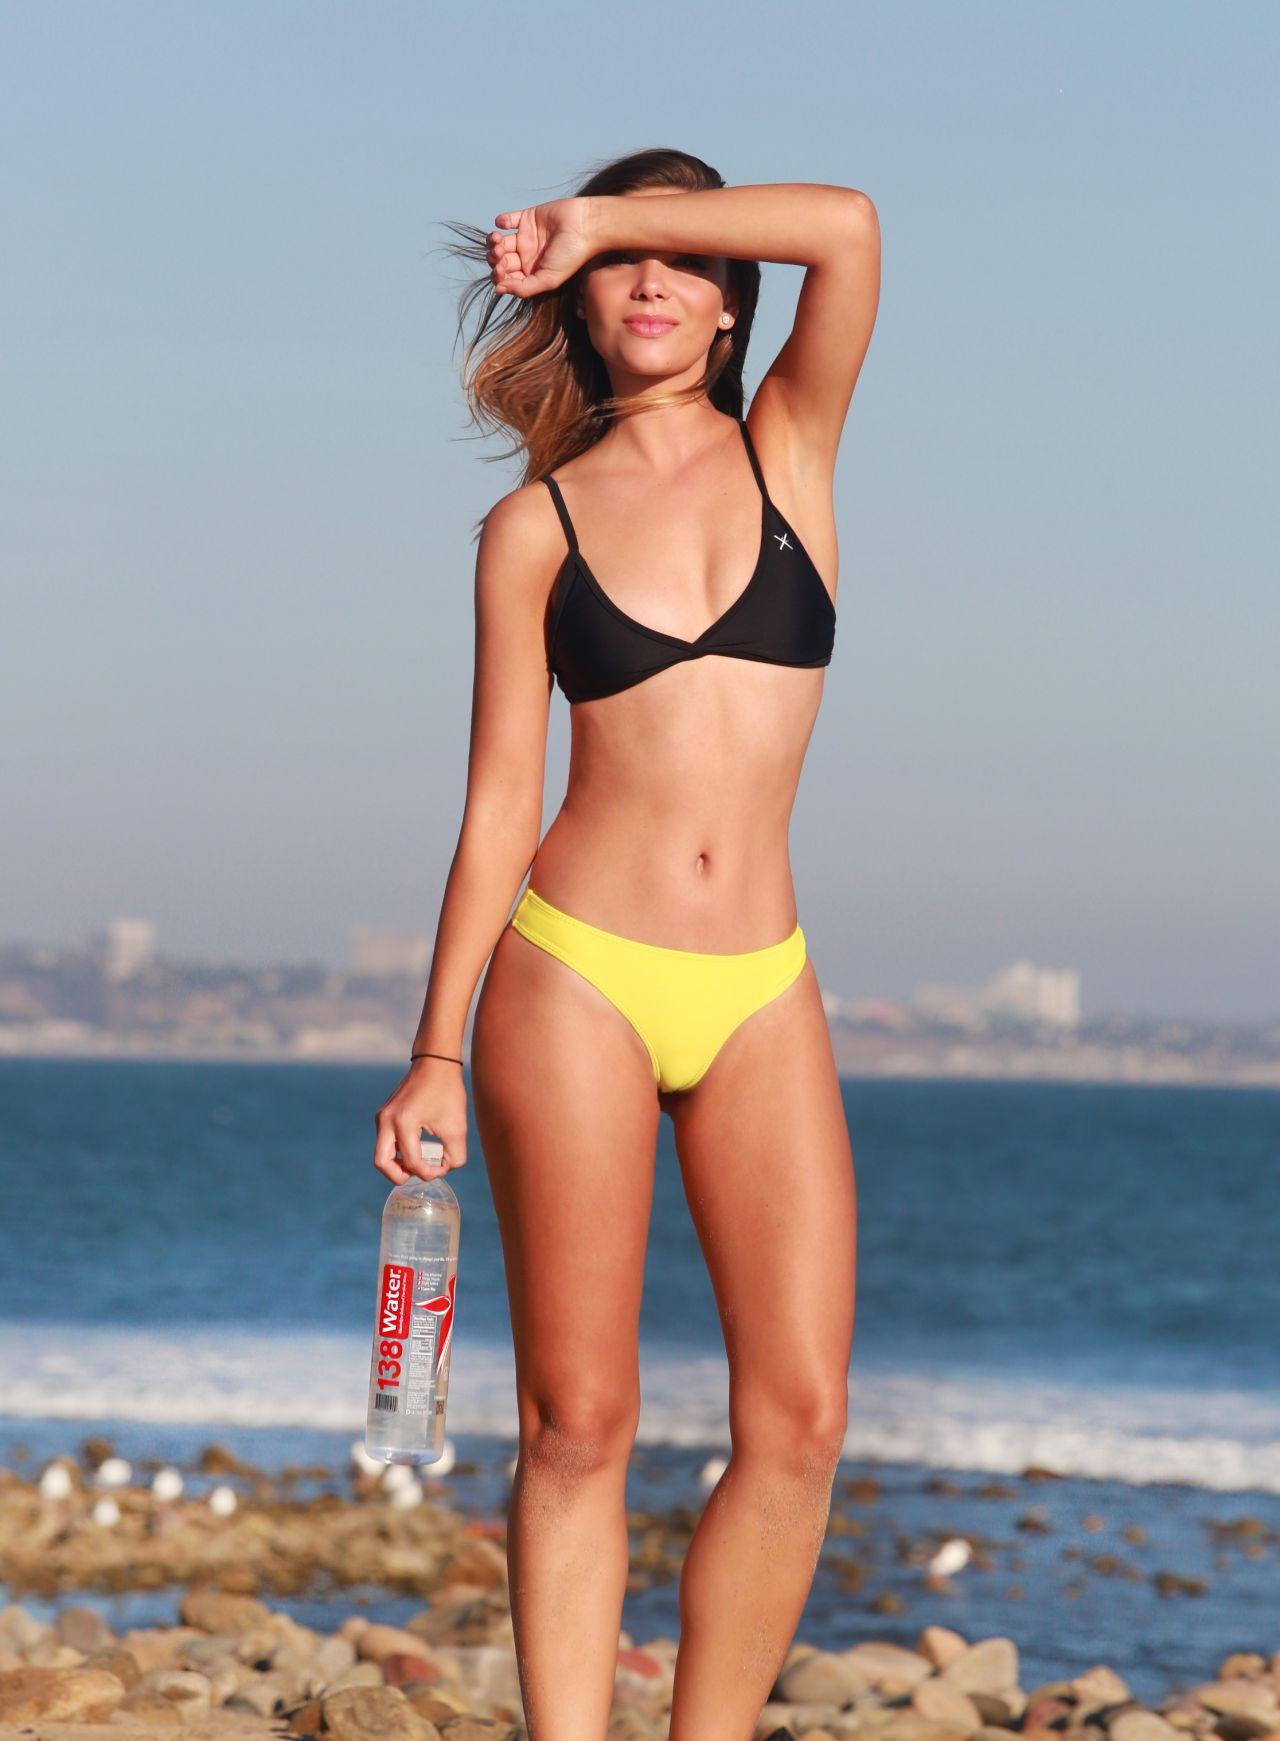 Chelsea Heath - 138 Water Bikini Photoshoot in Malibu - September 2014